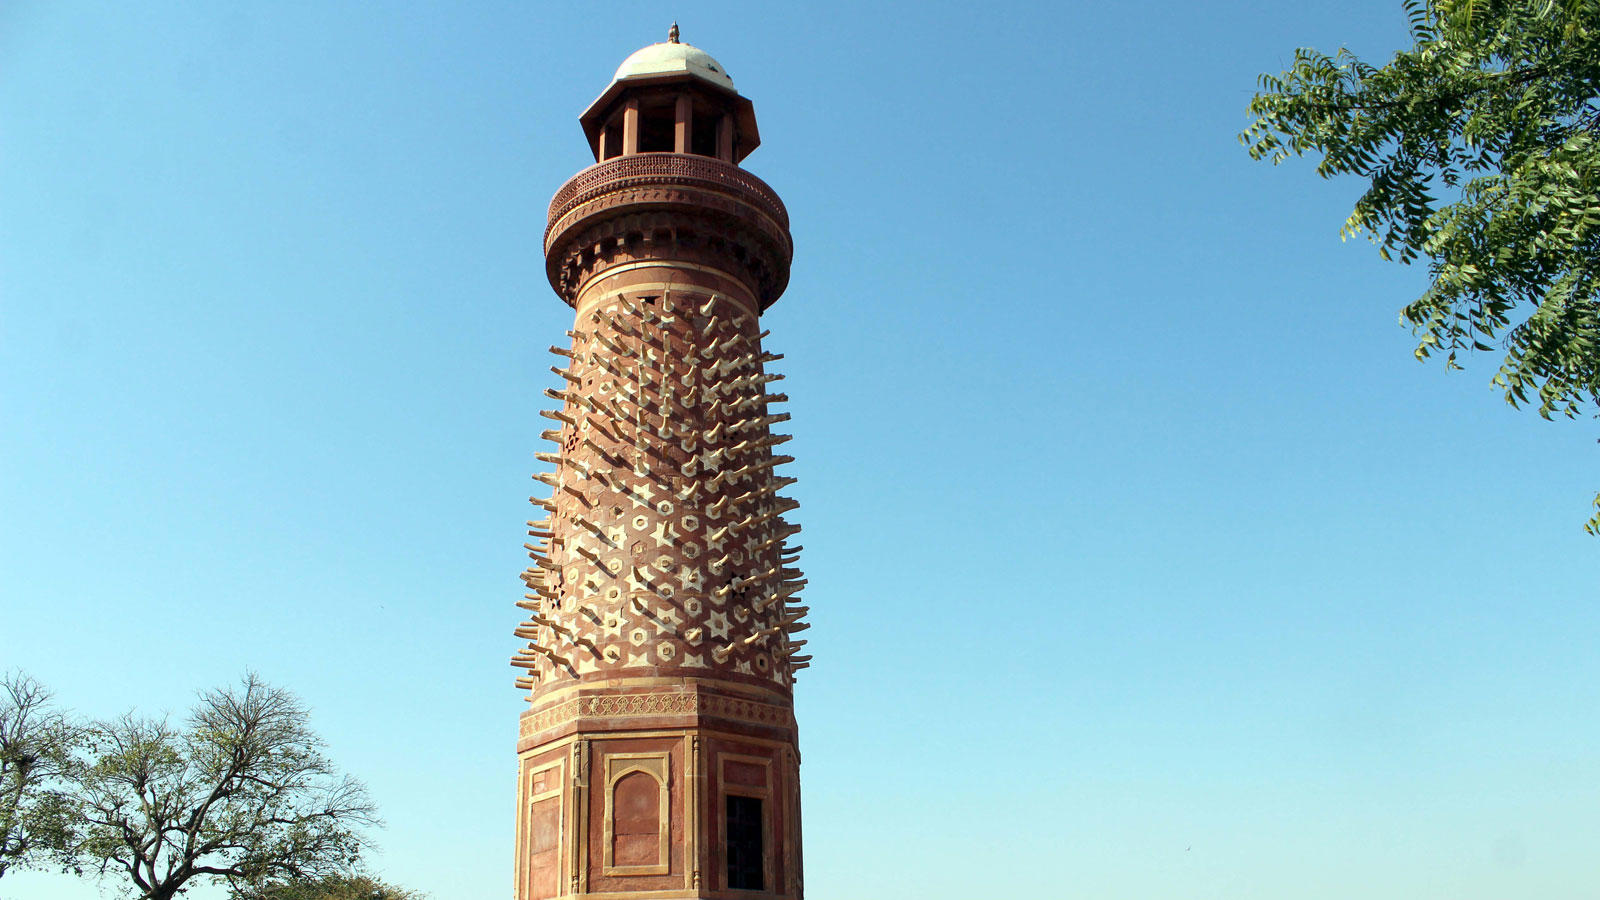 Hiran Minar in Fathepur Sikri, UP, falls under the third category (Photo courtesy: Hemant Kumar)